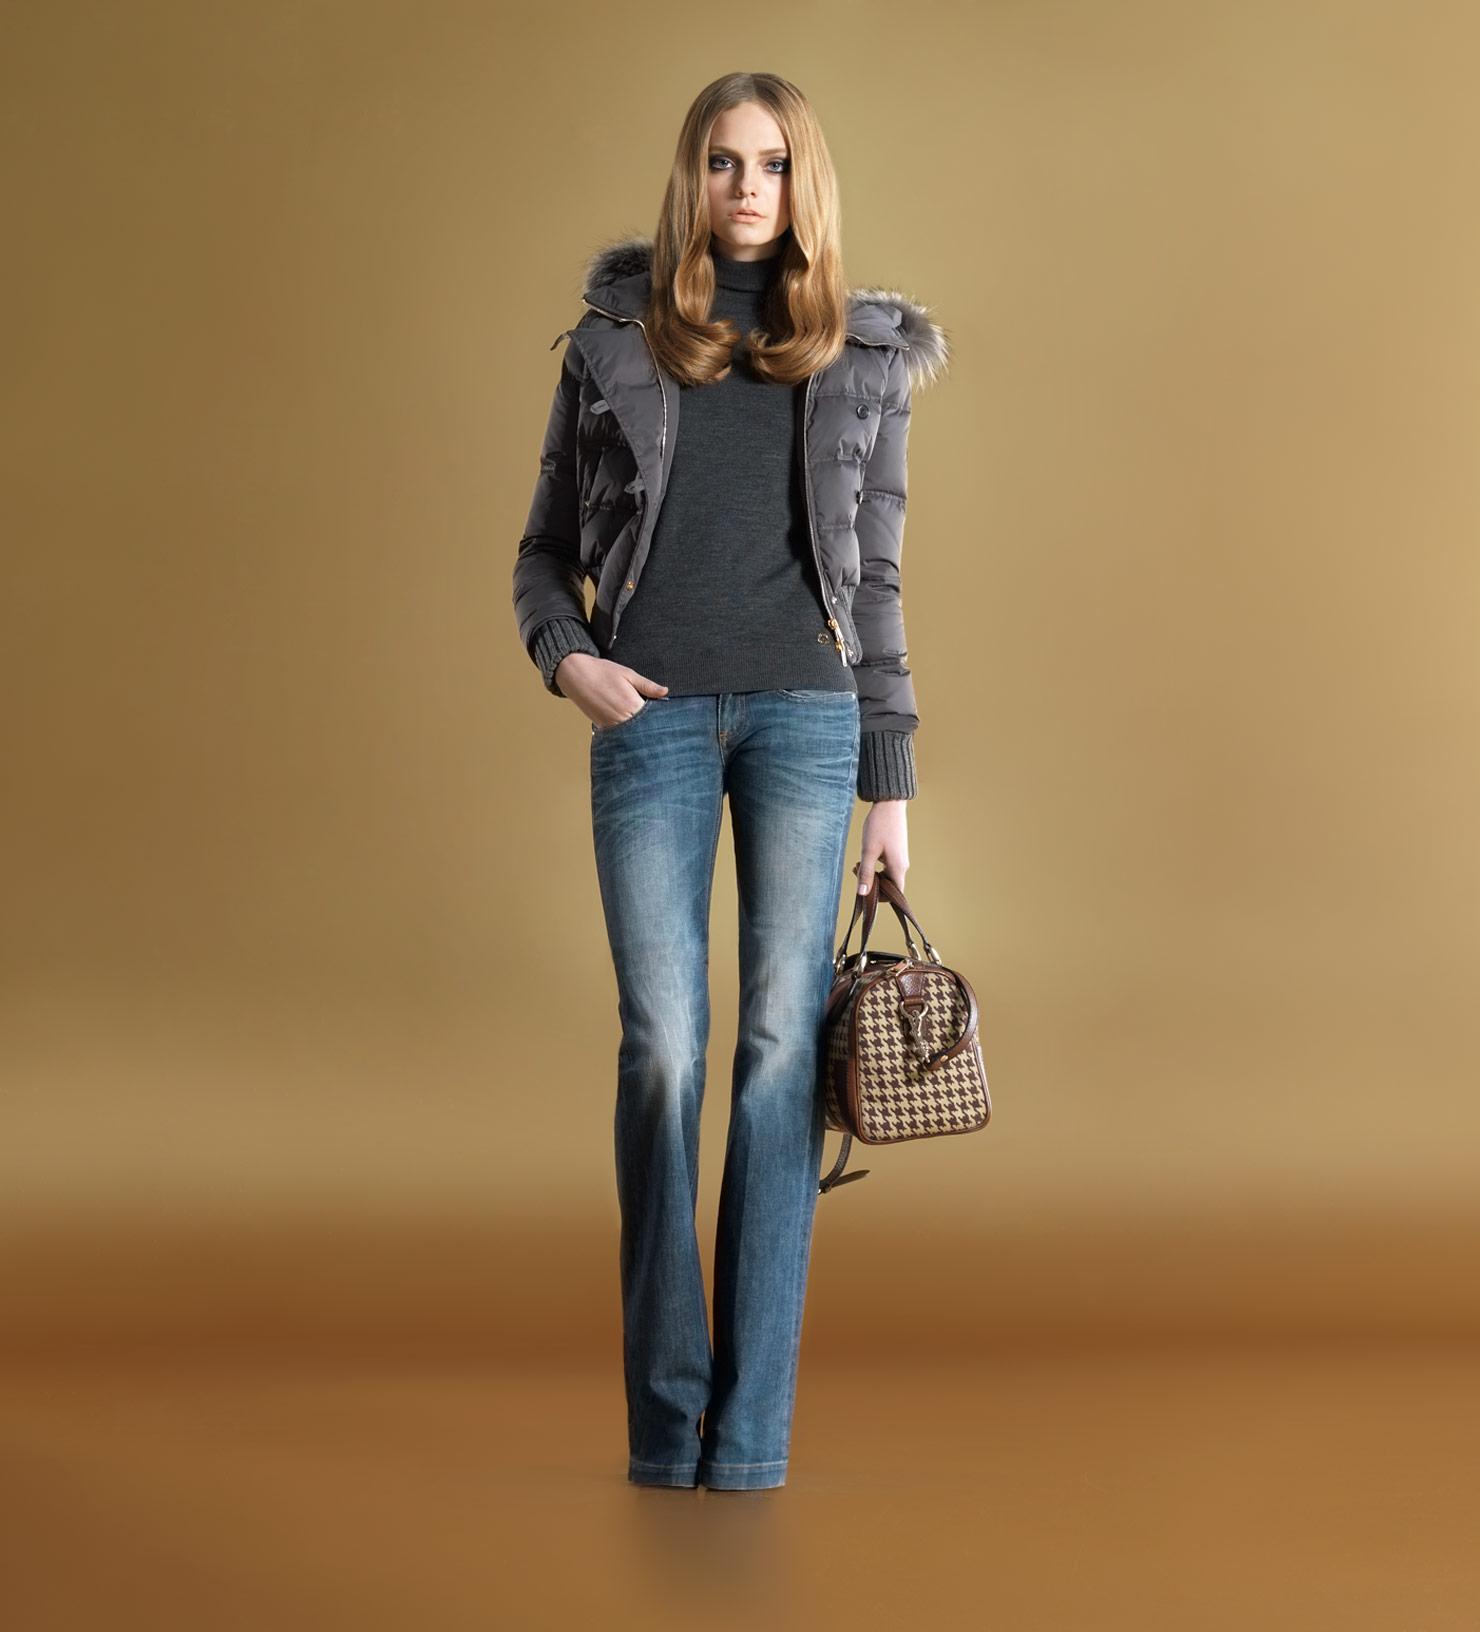 Осенняя мода с джинсами фото